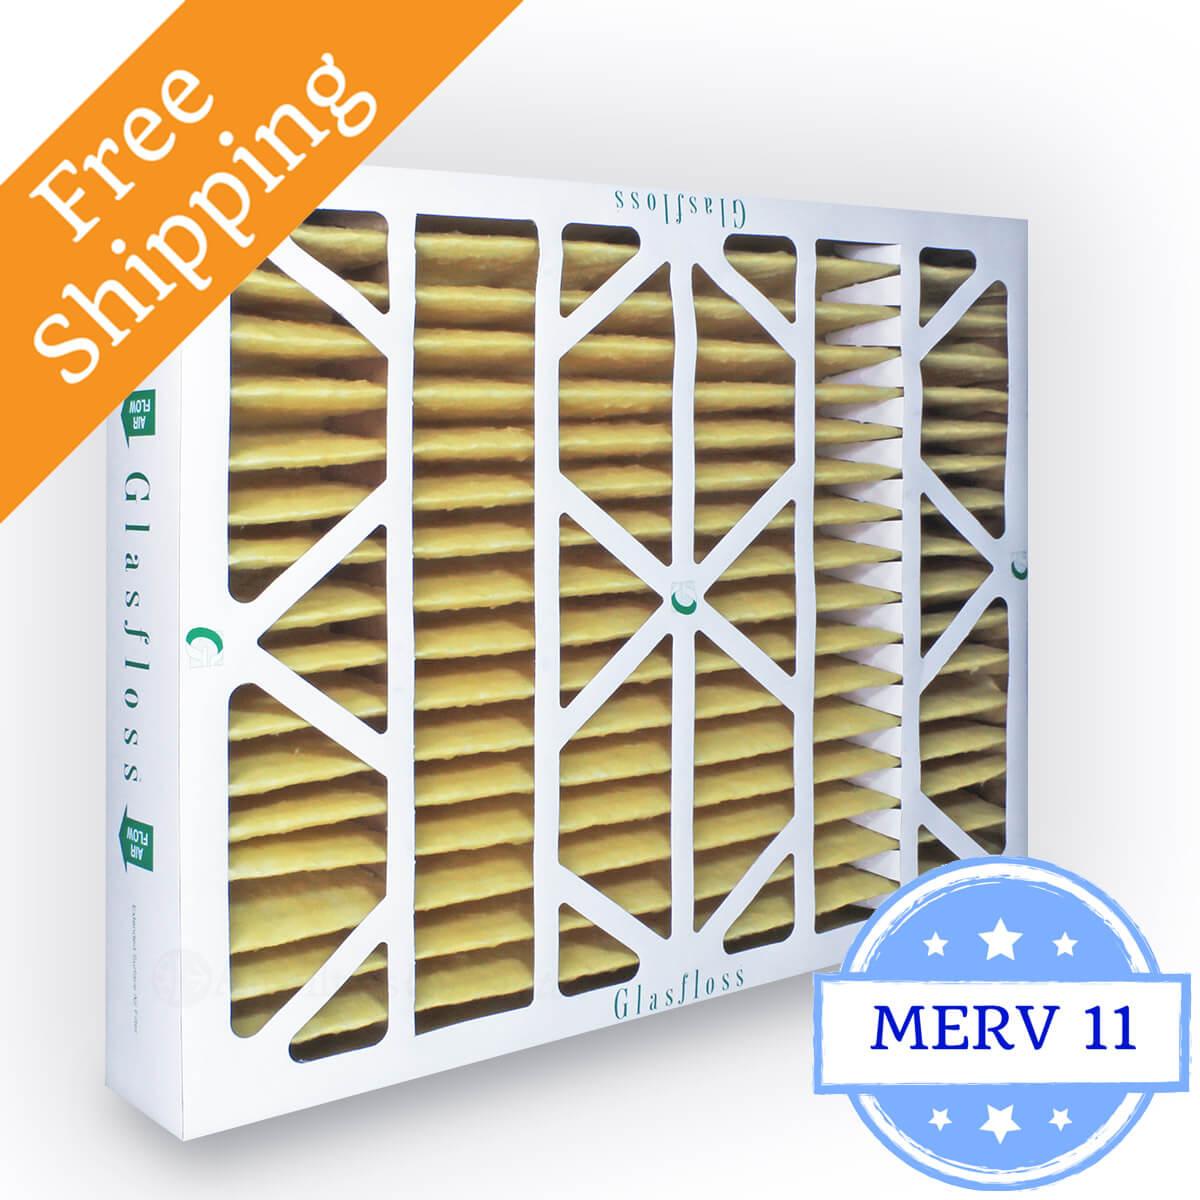 Glasfloss 16x25x4 Air Filter MR-11 Series